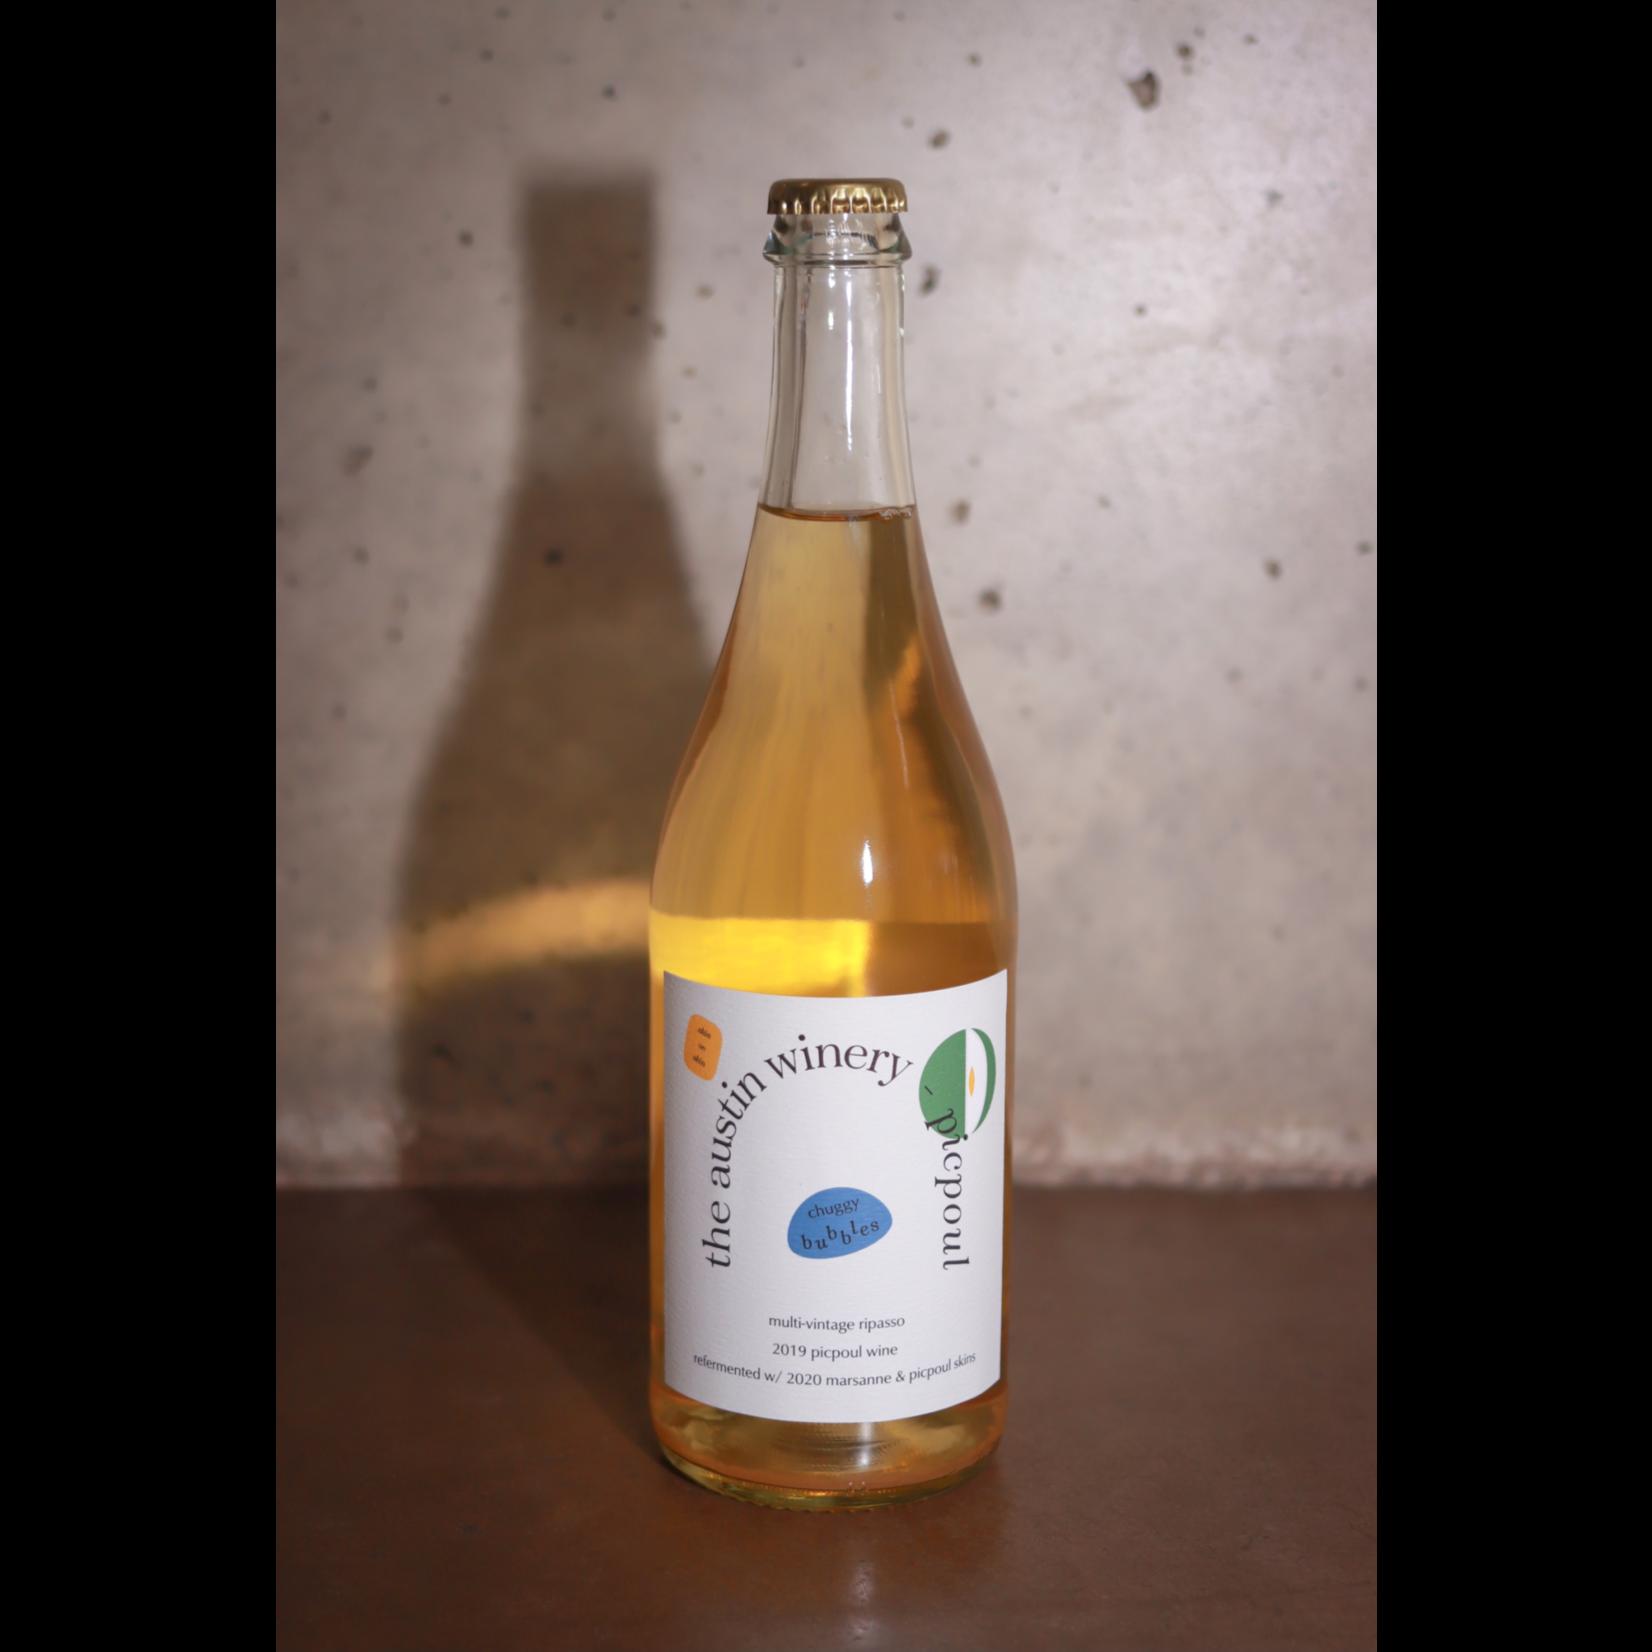 "Sparkling The Austin Winery Picpoul Pet Nat ""Chuggy Bubbles"" 2019"